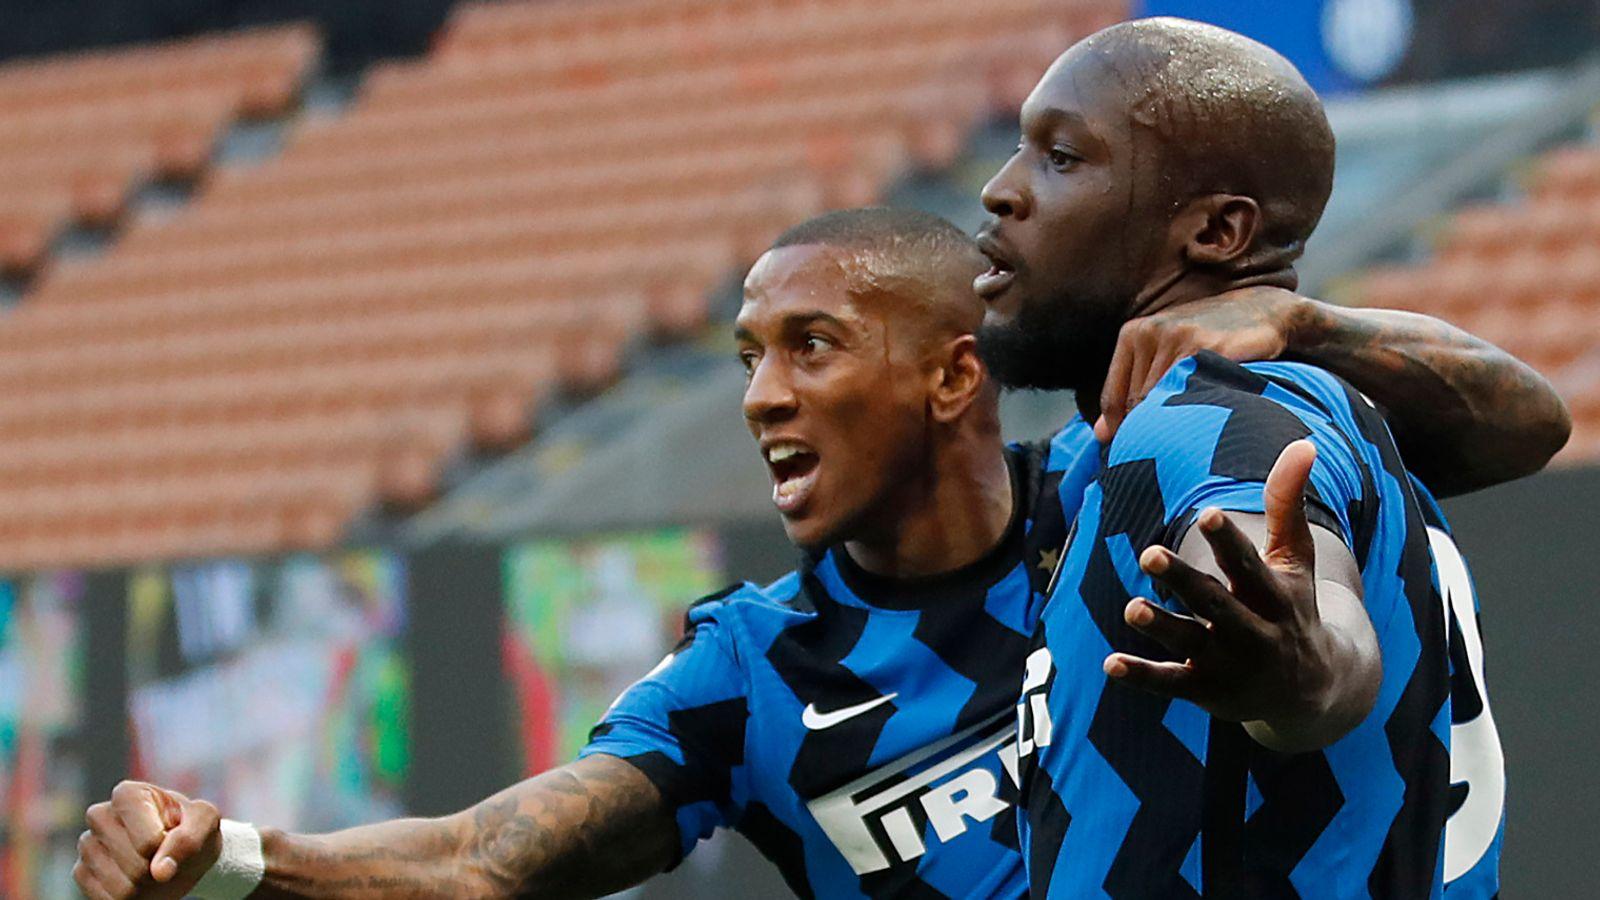 Inter Milan's Romelu Lukaku and Ashley Young facing fines for breaching Italy's coronavirus legislation